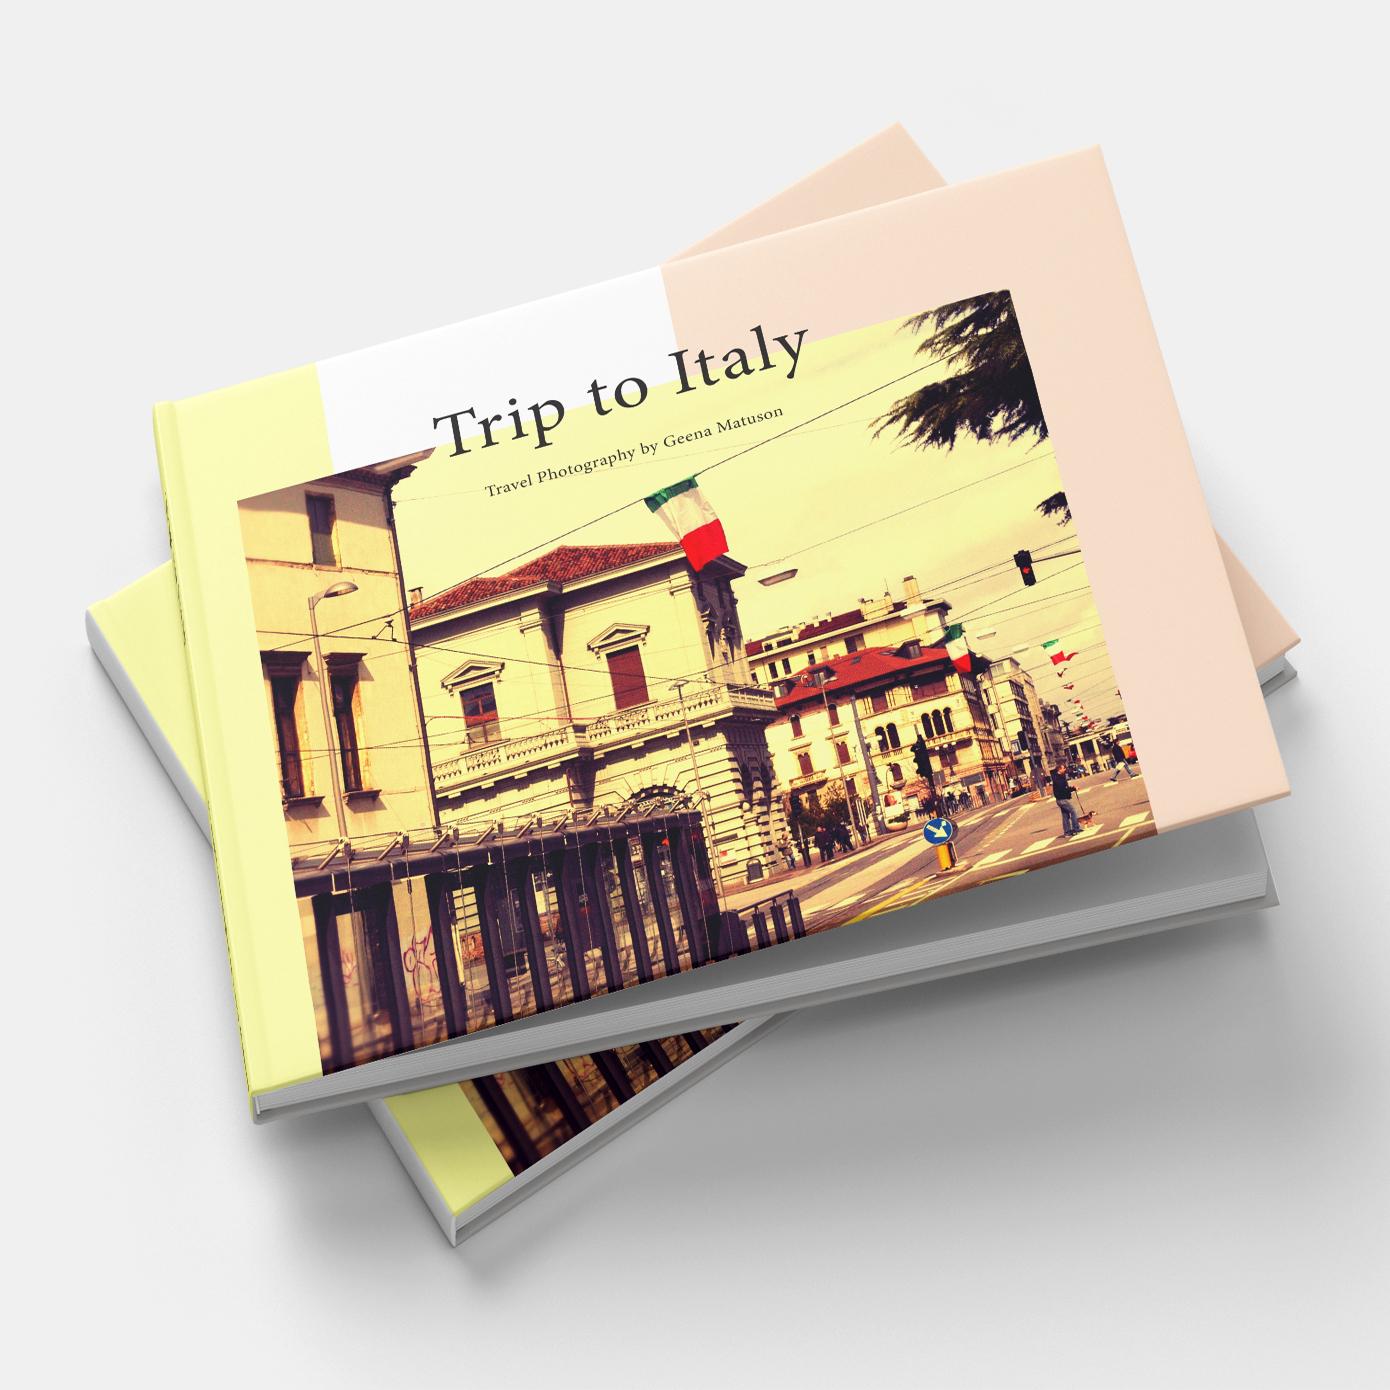 GeenaMatuson_TheGirlMirage_Trip-to-Italy_Book_Preview-SQ.jpg